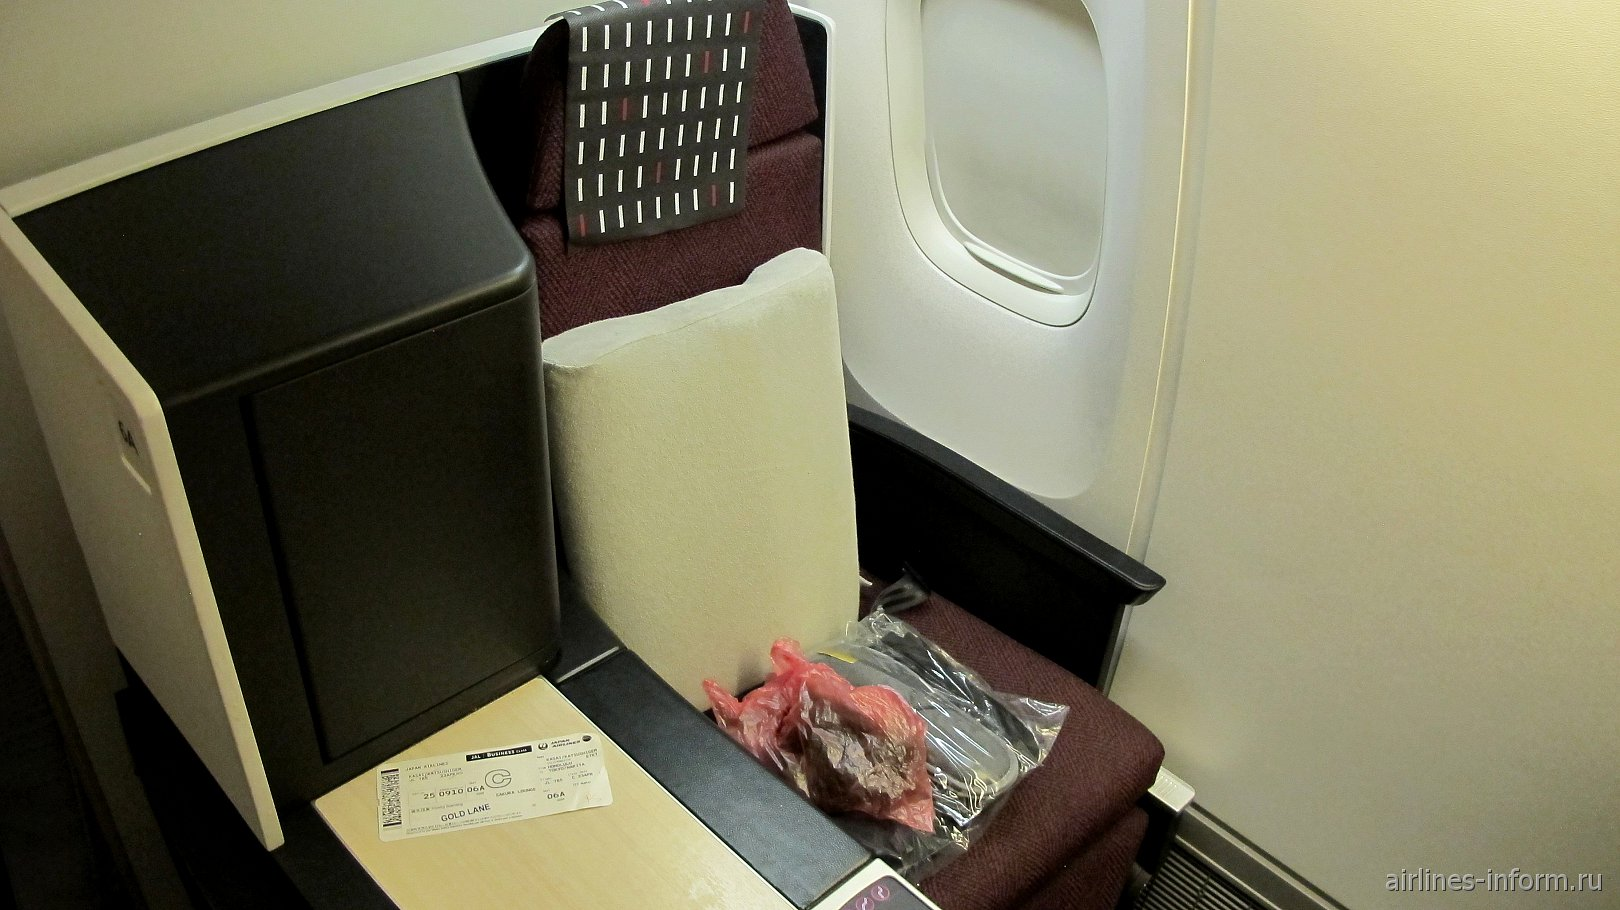 ����� ������-������ � ������-767-300 �������� ���������